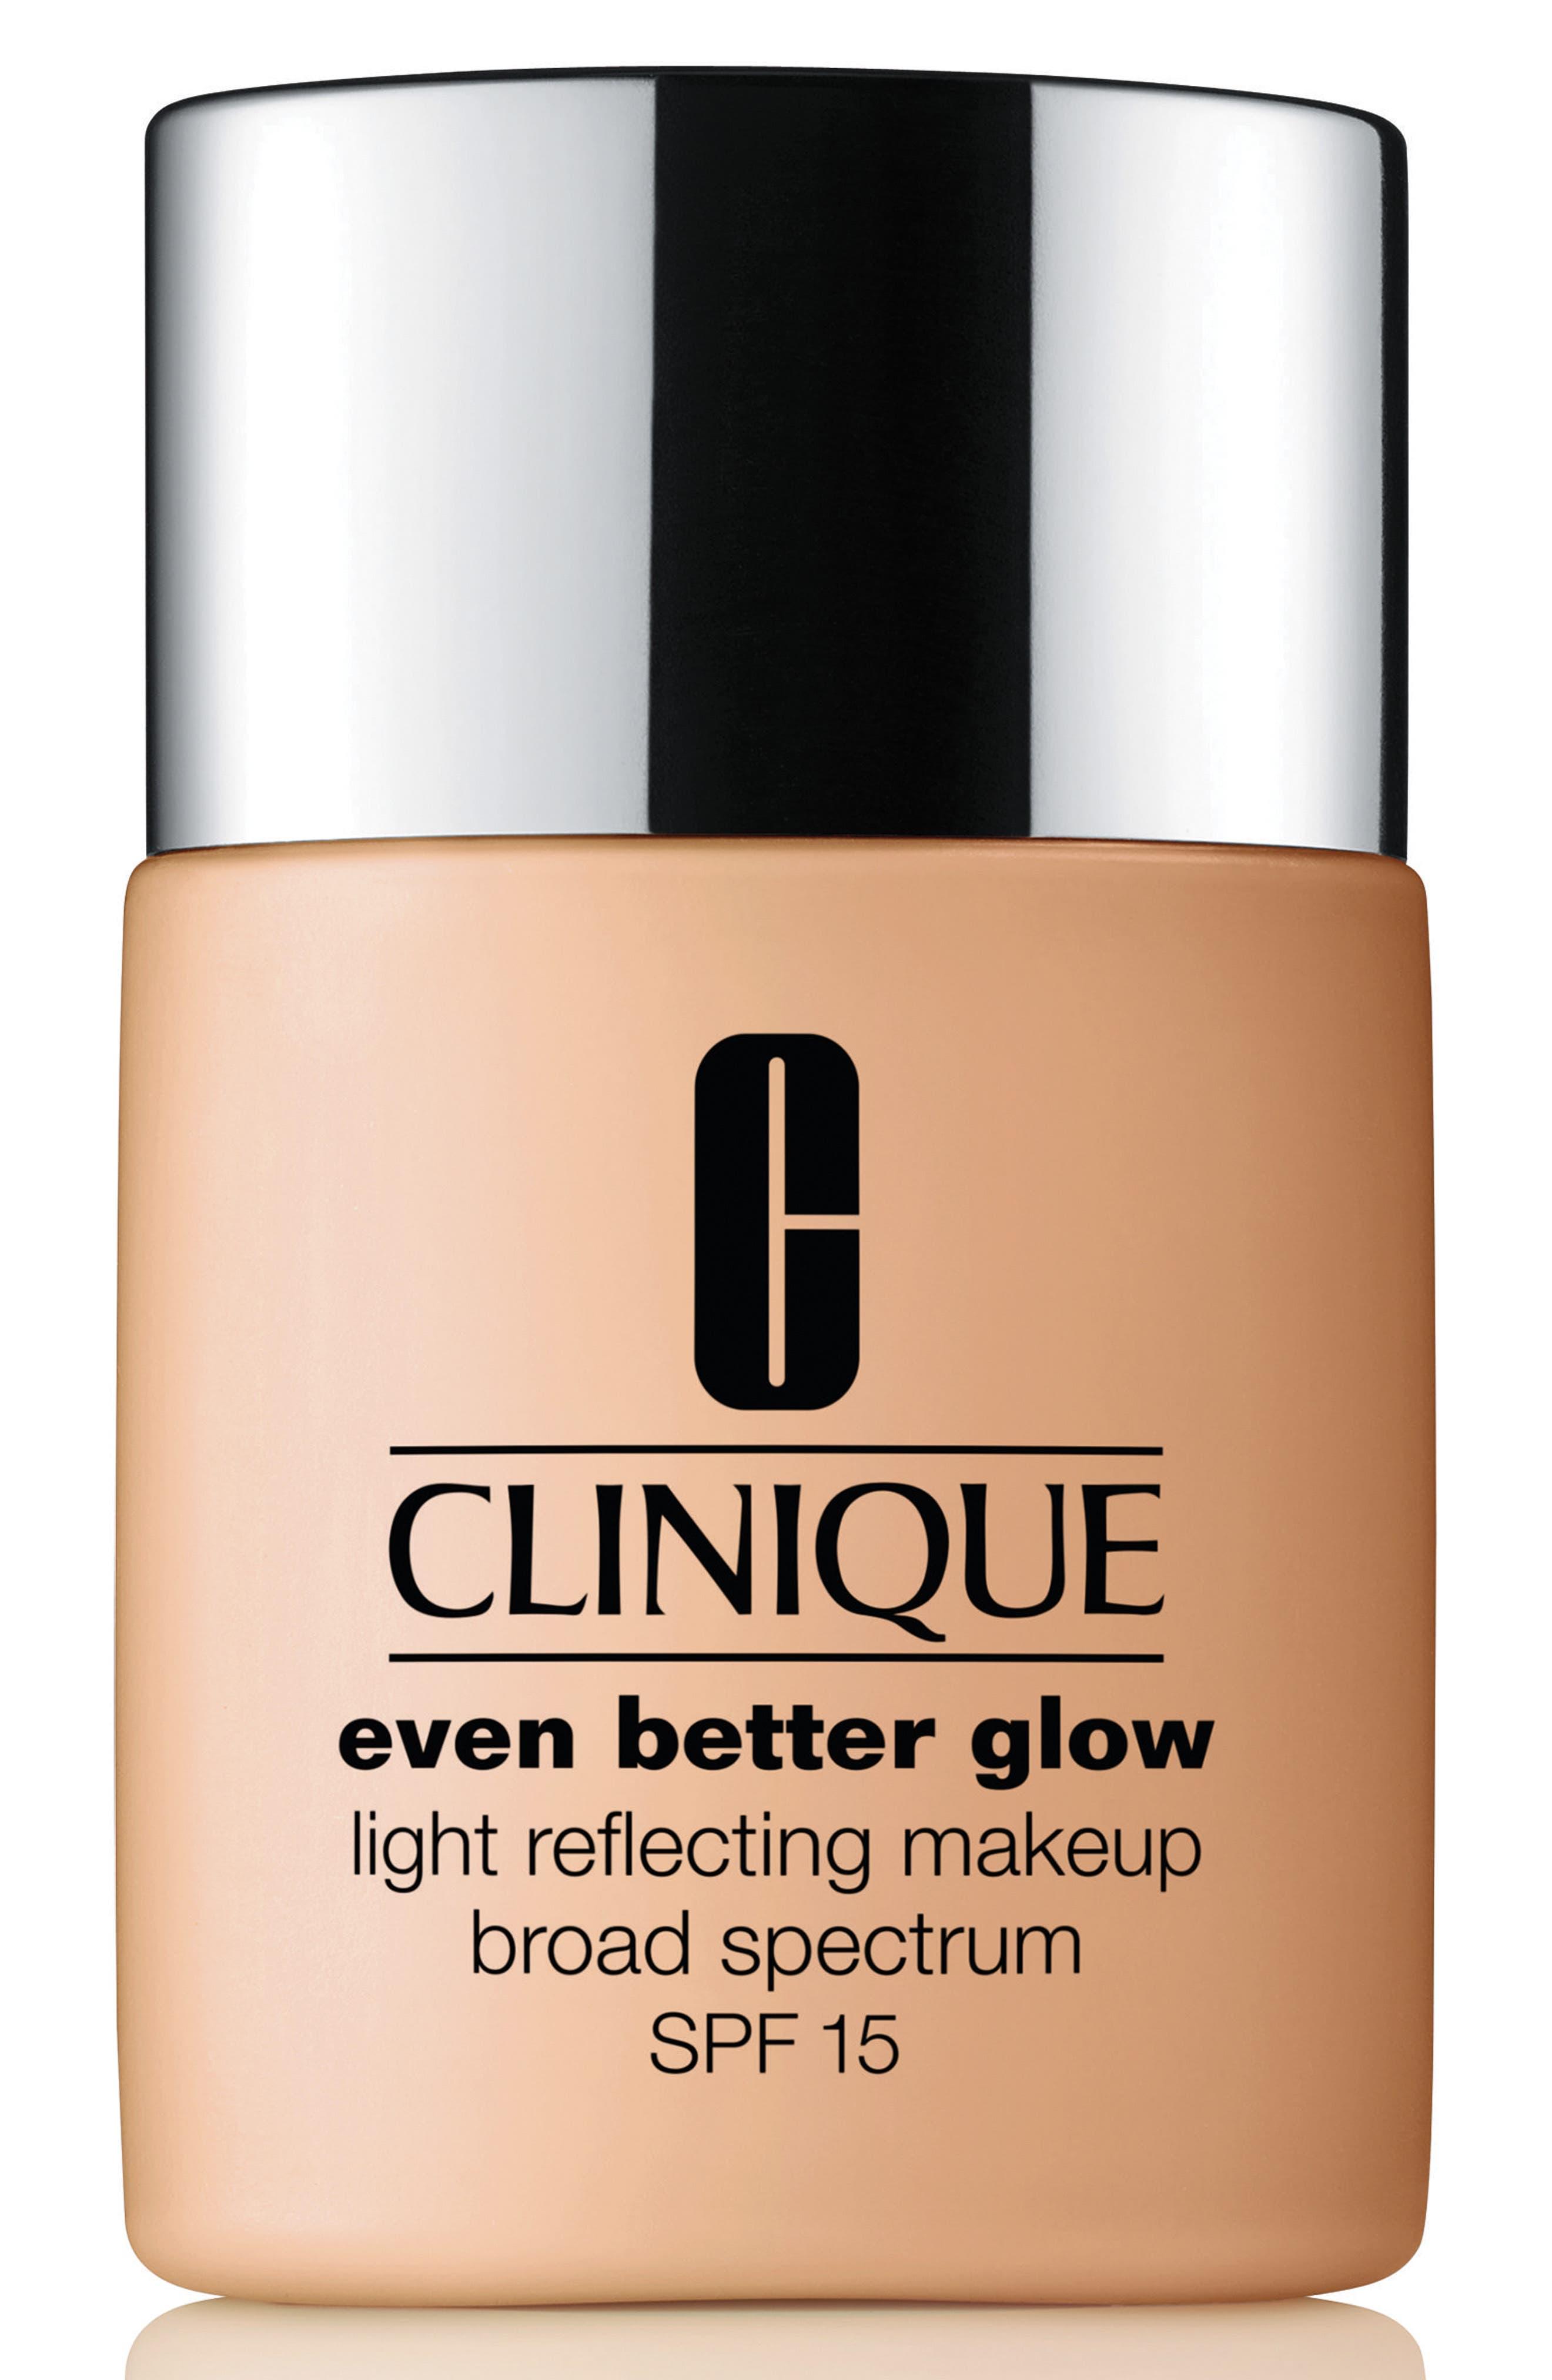 Even Better & #153 Glow Light Reflecting Makeup Broad Spectrum Spf 15, 1.0 Oz./ 30 Ml in Ecru